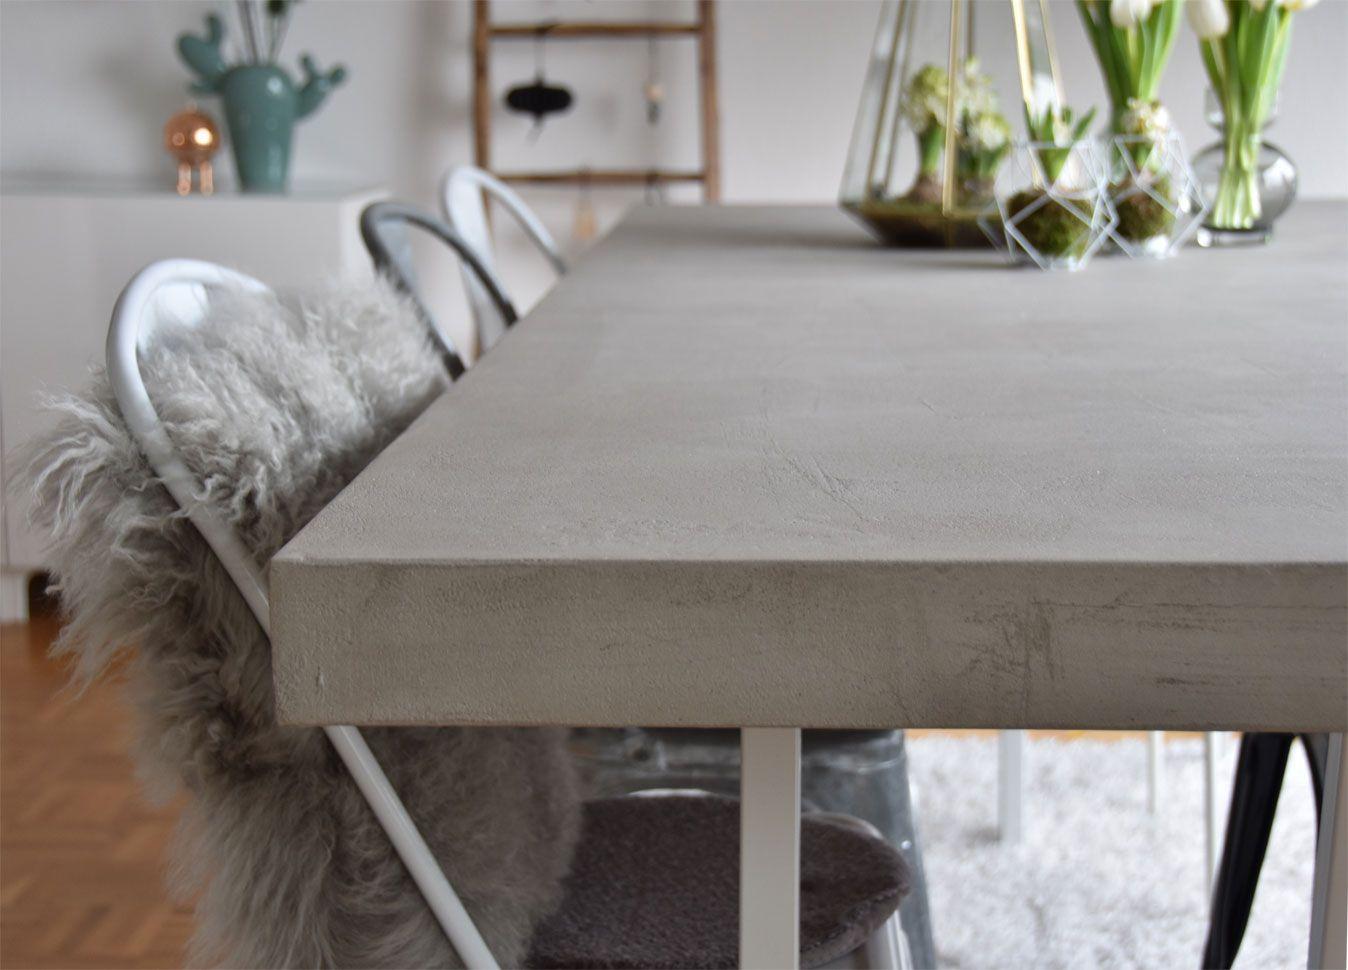 Forbeton destiné diy - tischplatte in betonoptik   diy - furniture   pinterest   diy